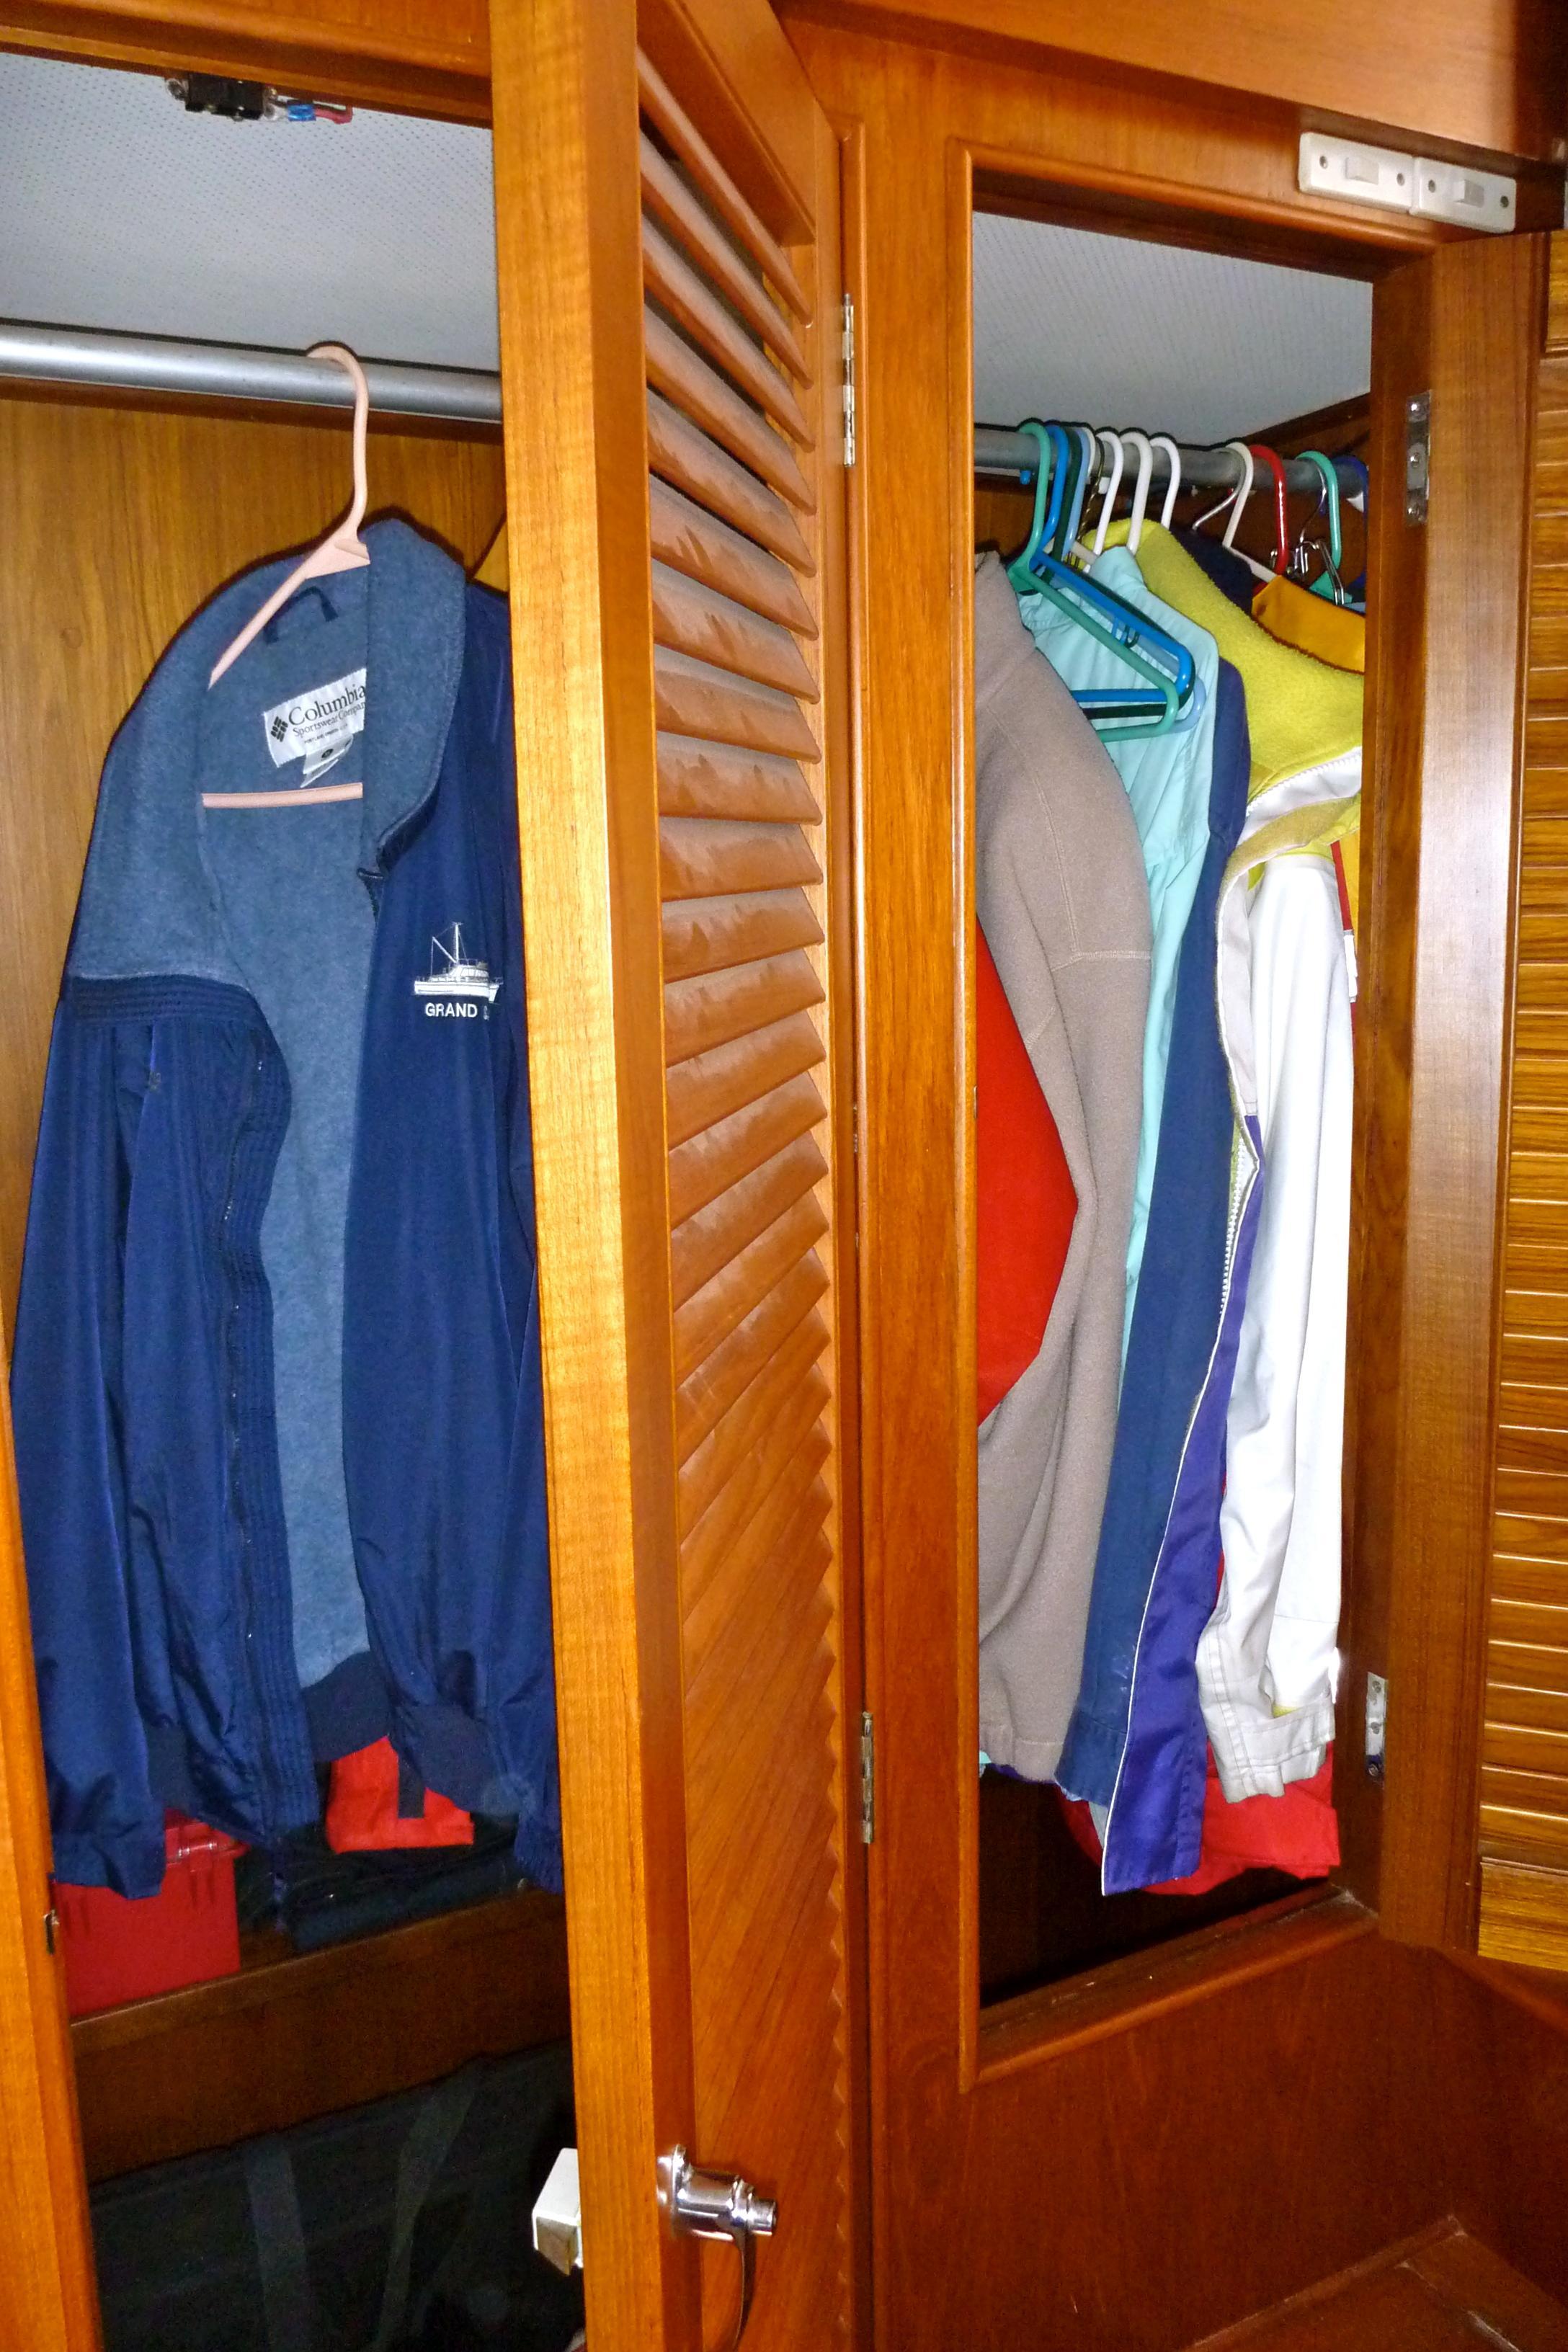 Hanging locker in Aft stateroom